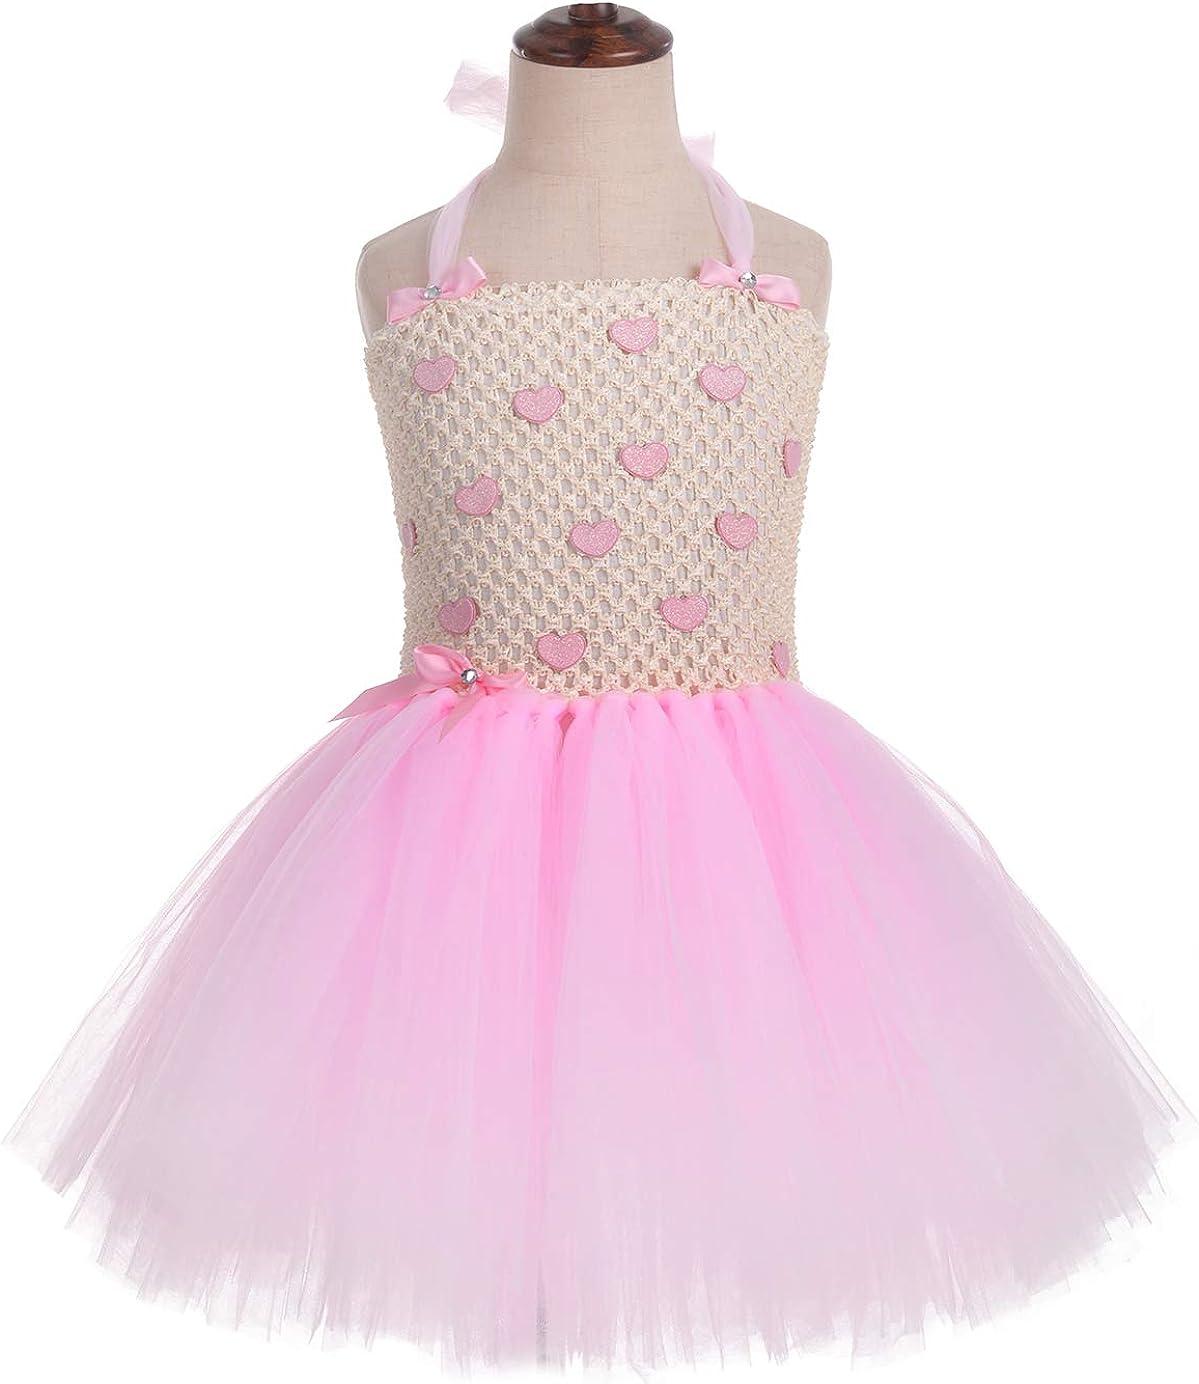 Tutu Dreams Pink Hearts Tutu Dress for Girls Princess Dress Up Birthday Tea Party